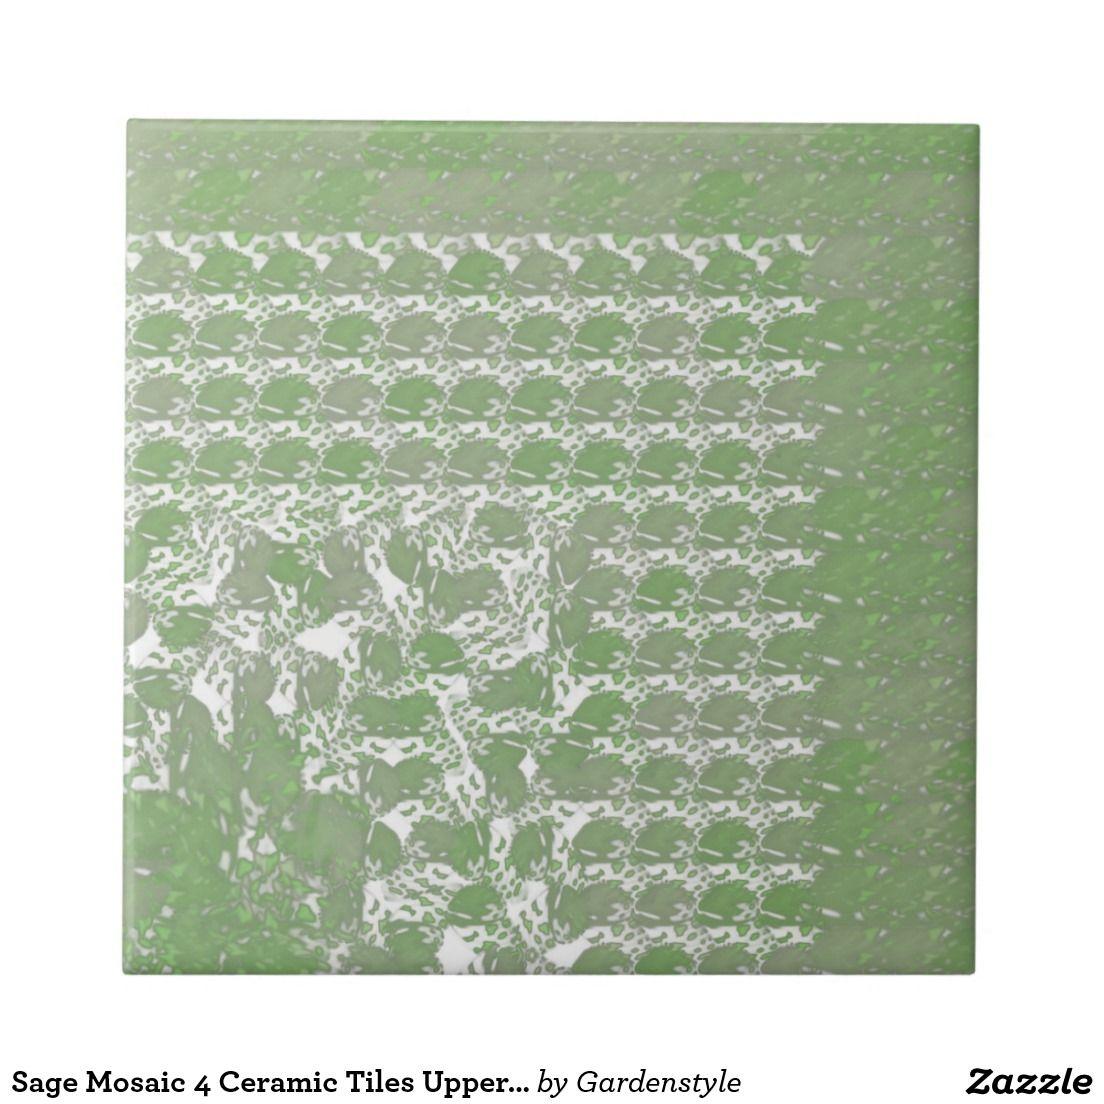 Sage mosaic 4 ceramic tiles upper right interiors sage mosaic 4 ceramic tiles upper right dailygadgetfo Gallery